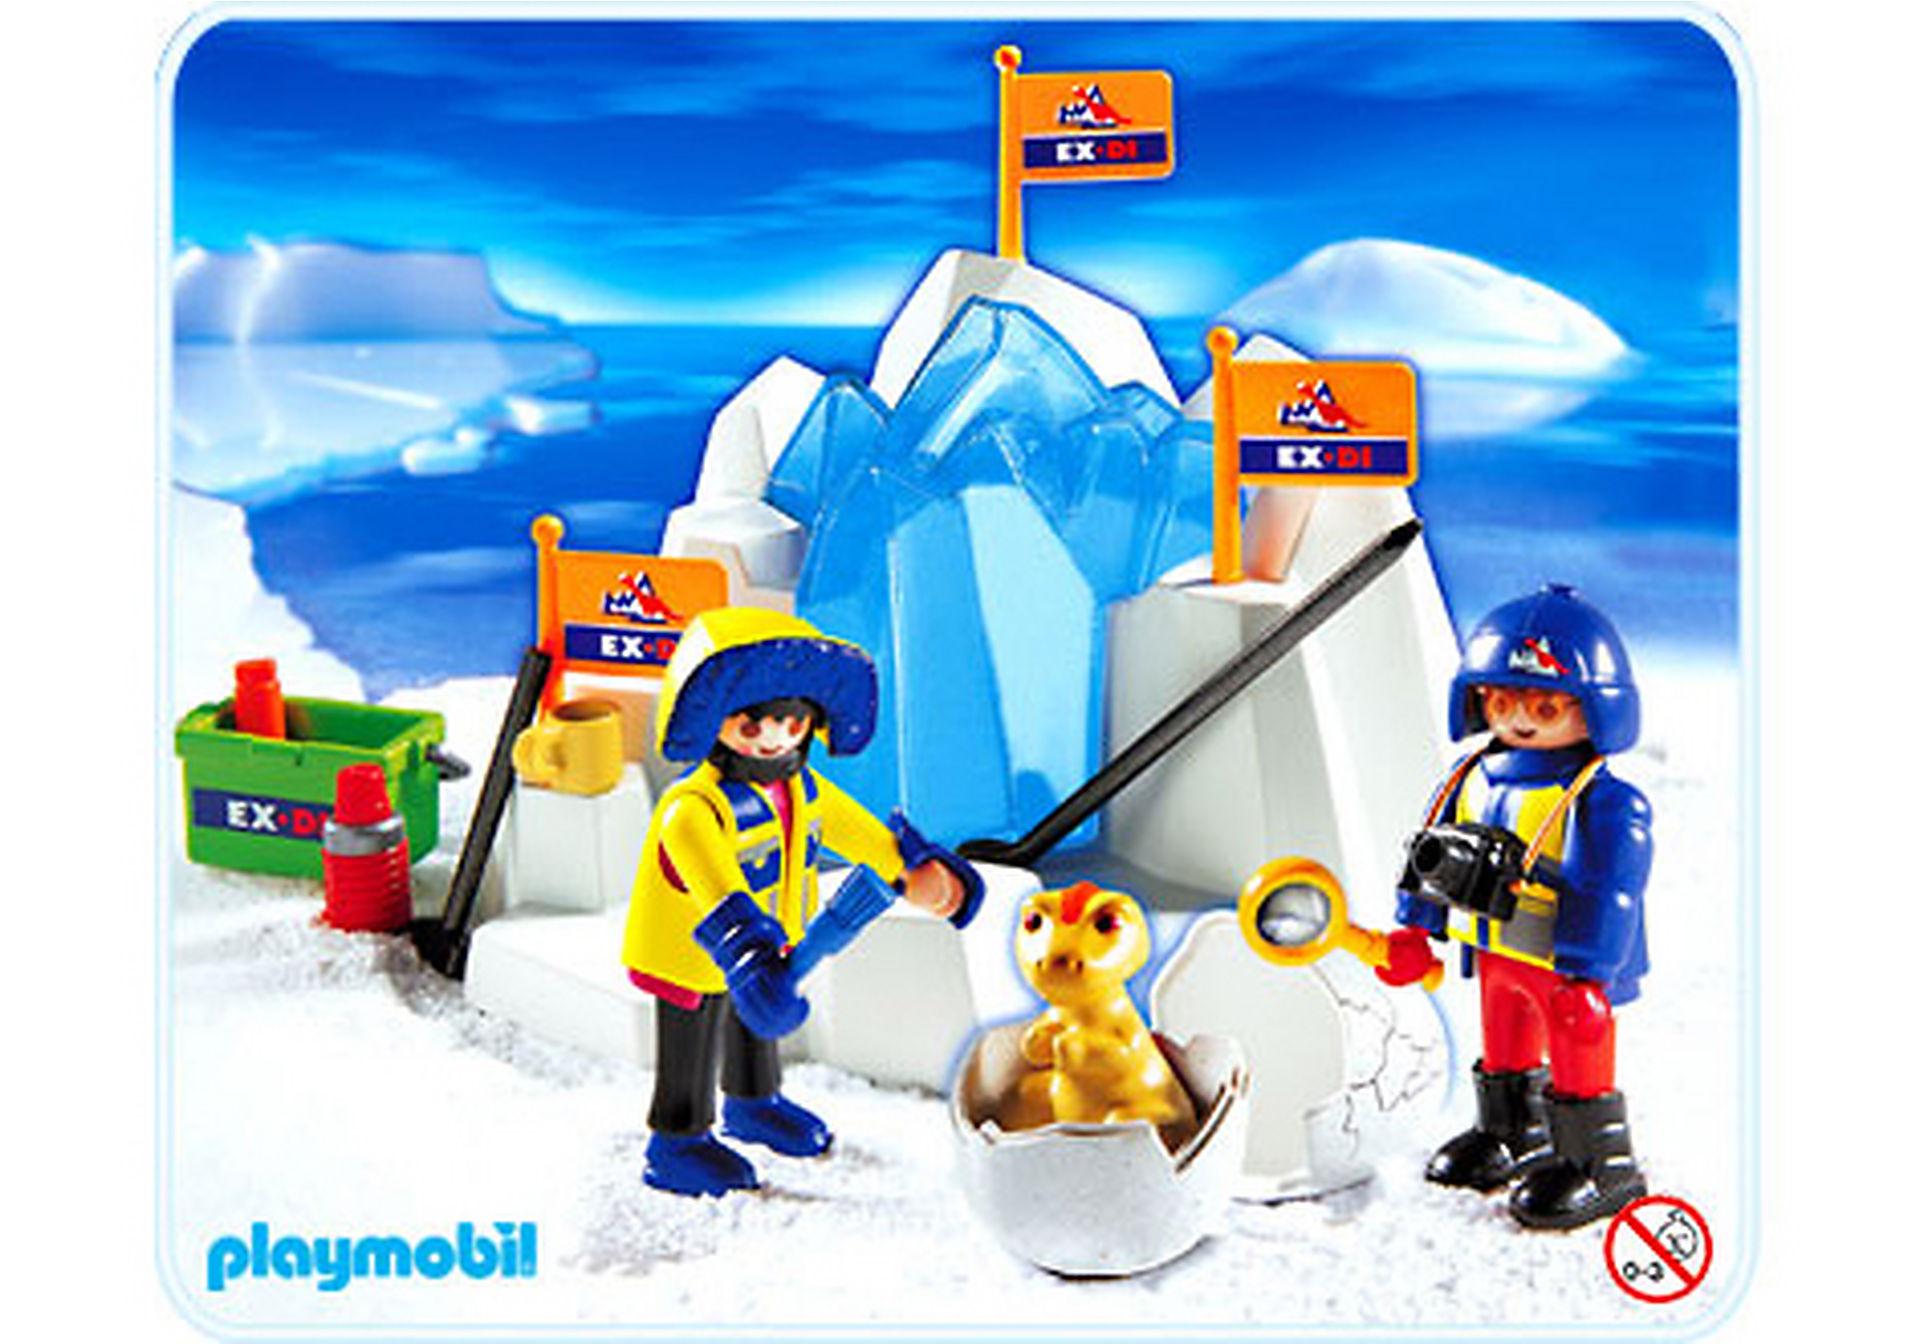 3193-A Oeuf de dinosaure pris dans la glace zoom image1